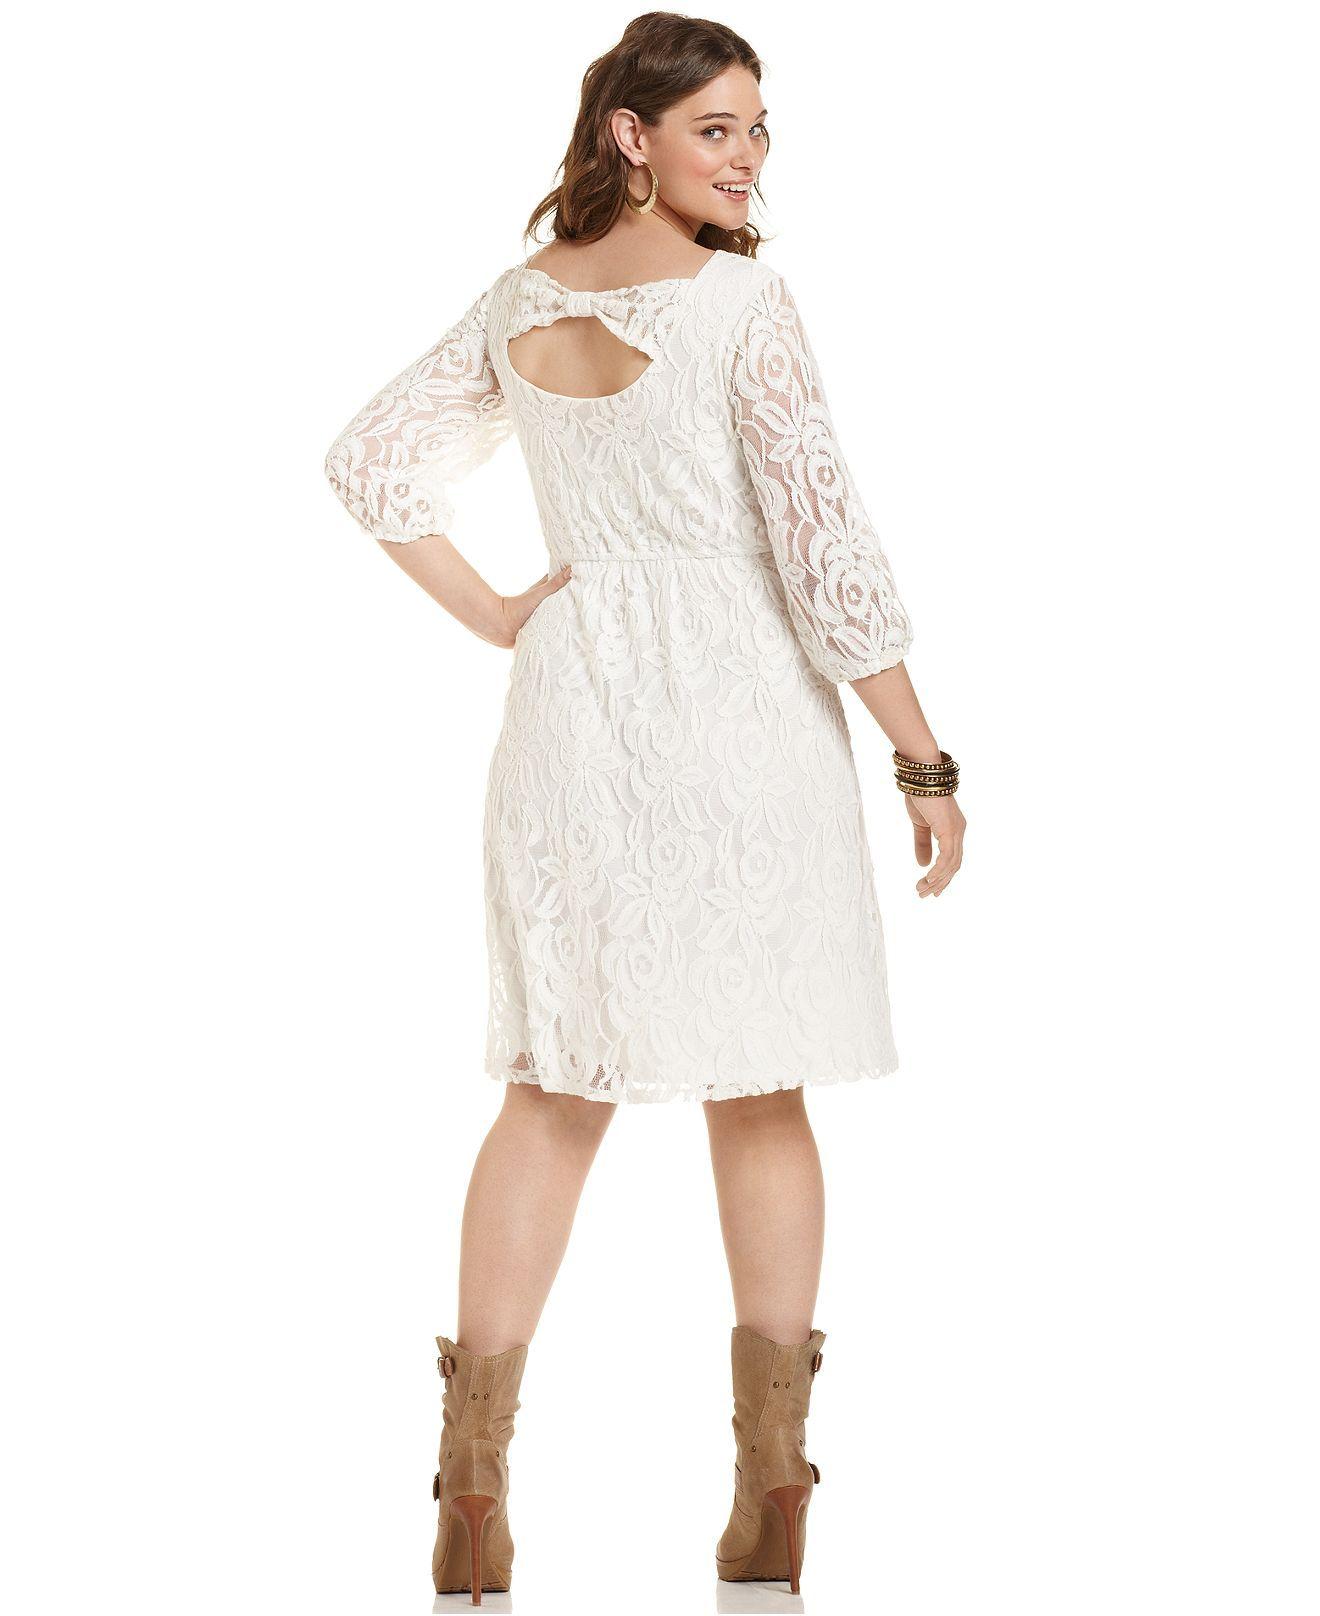 ING Plus Size Dress Three Quarter Sleeve Lace Plus Size Dresses